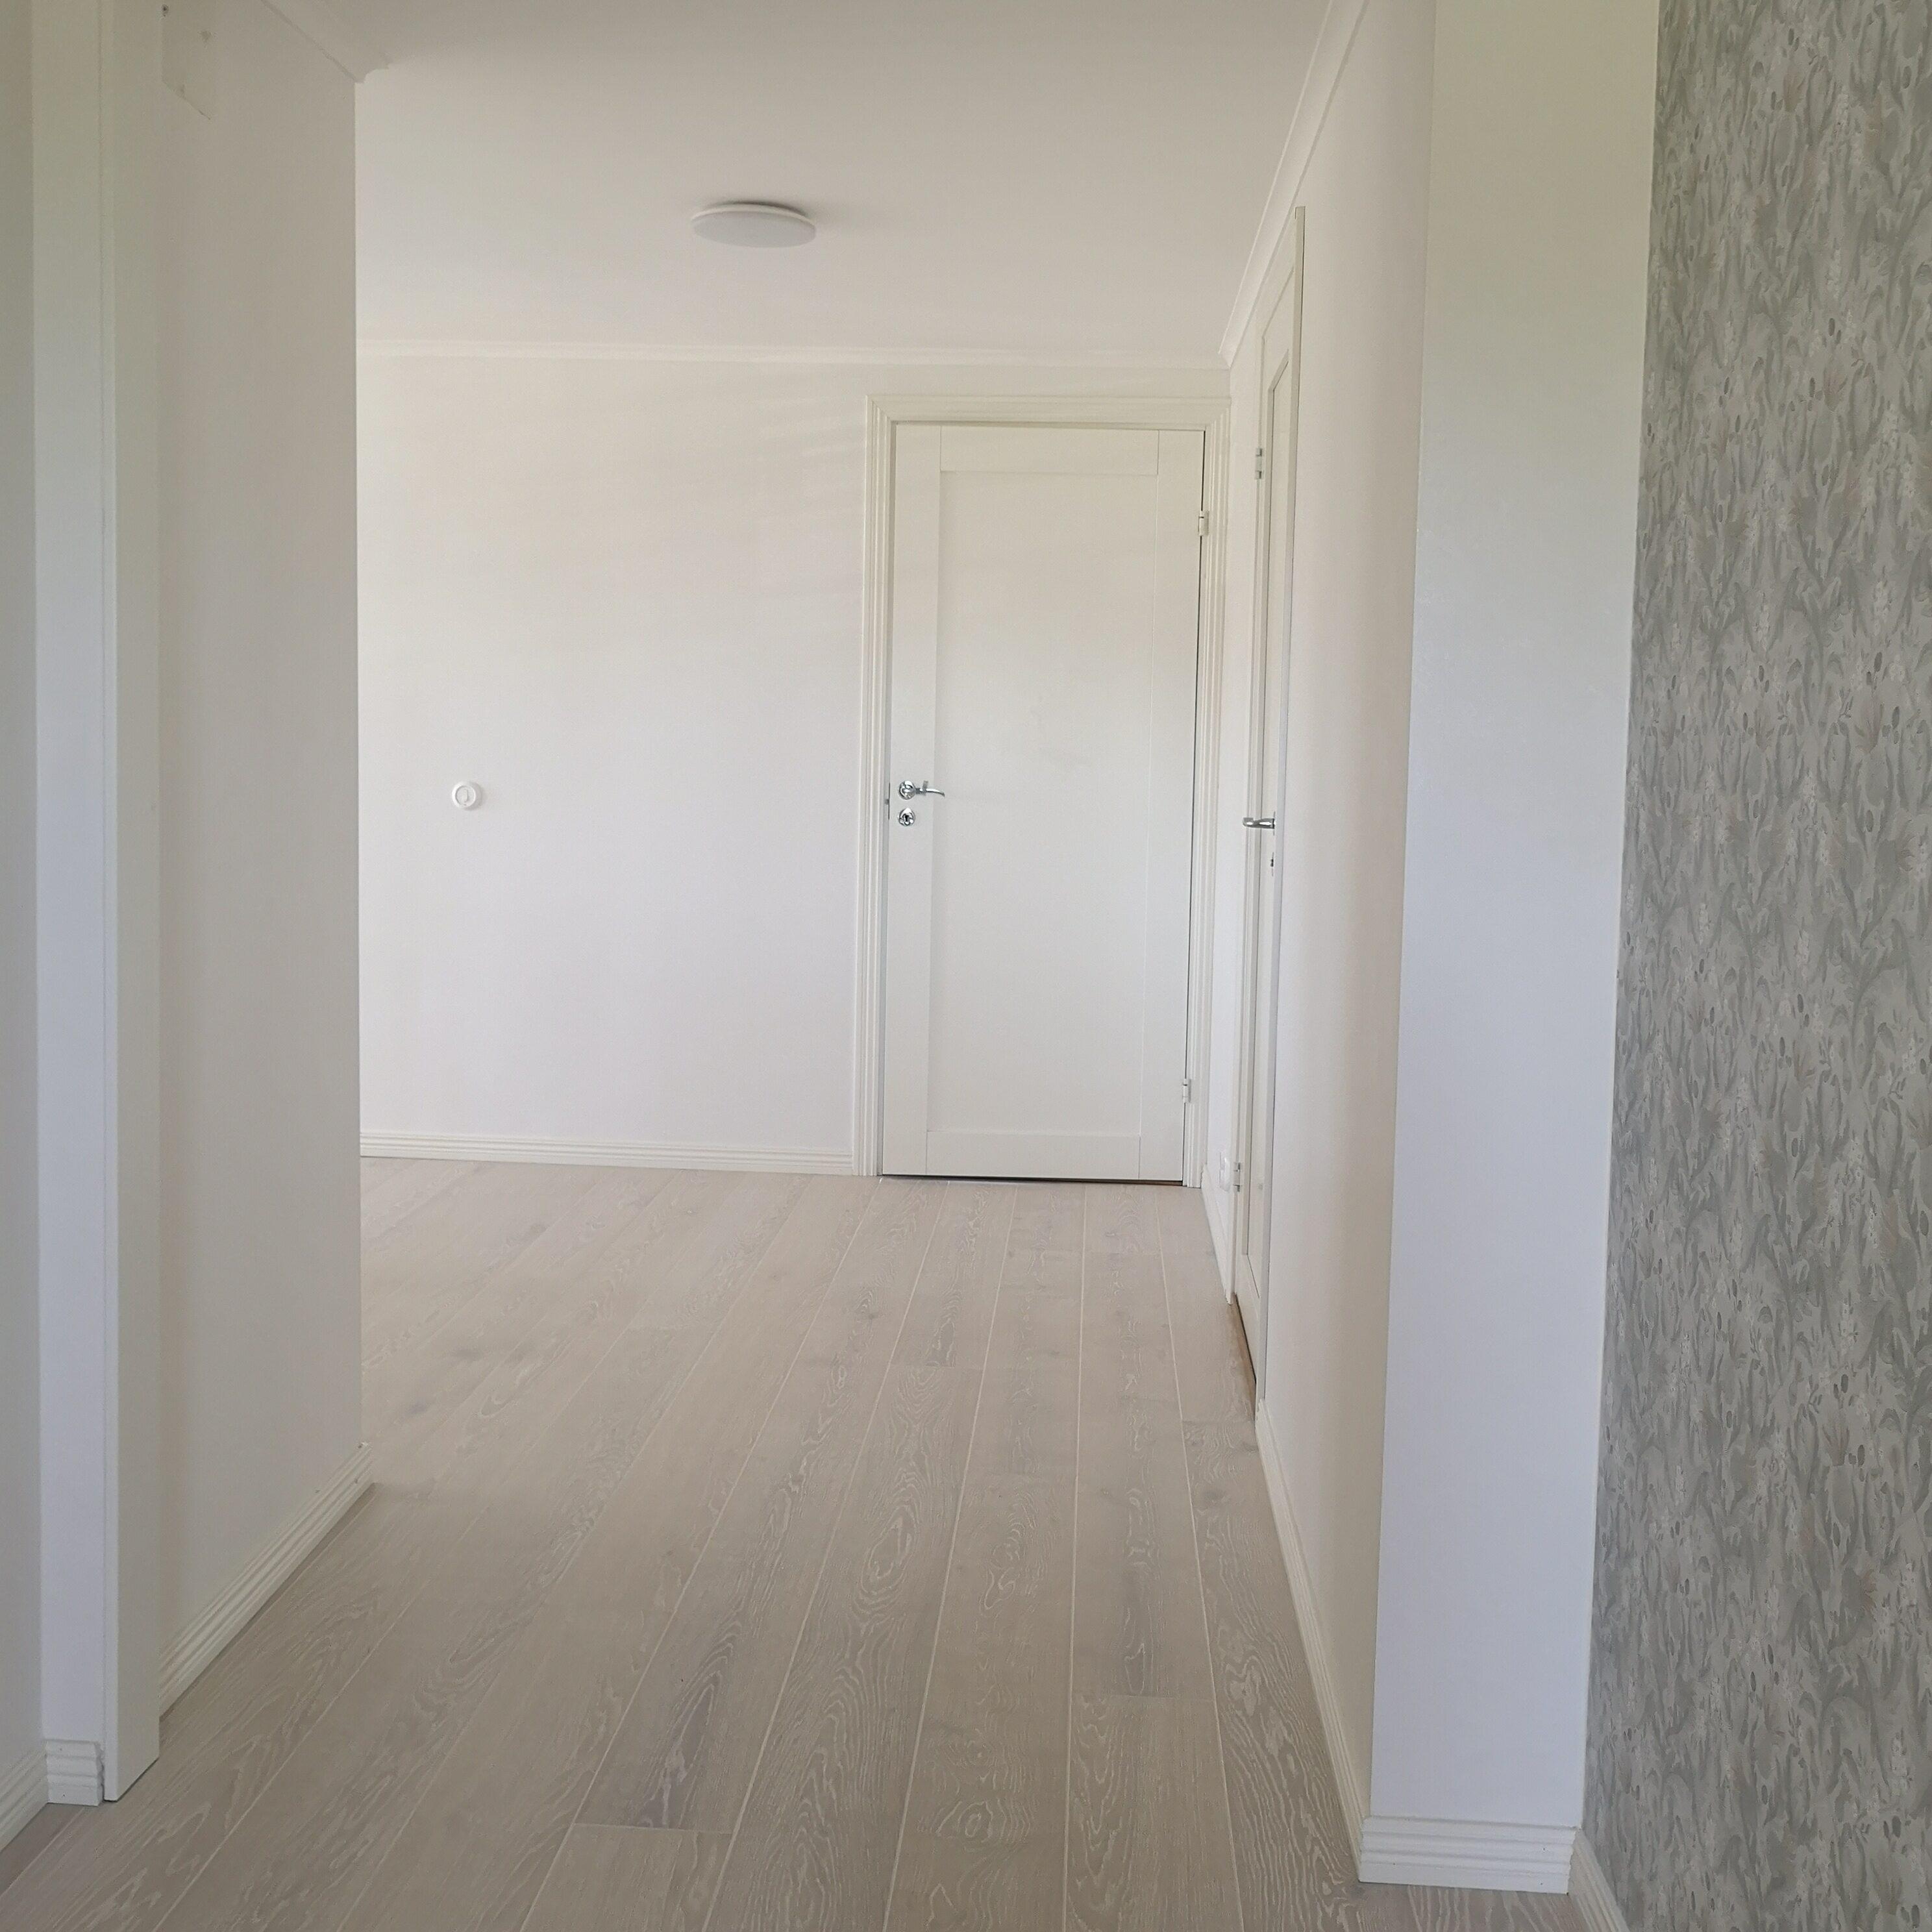 Nybyggt hus, interiör